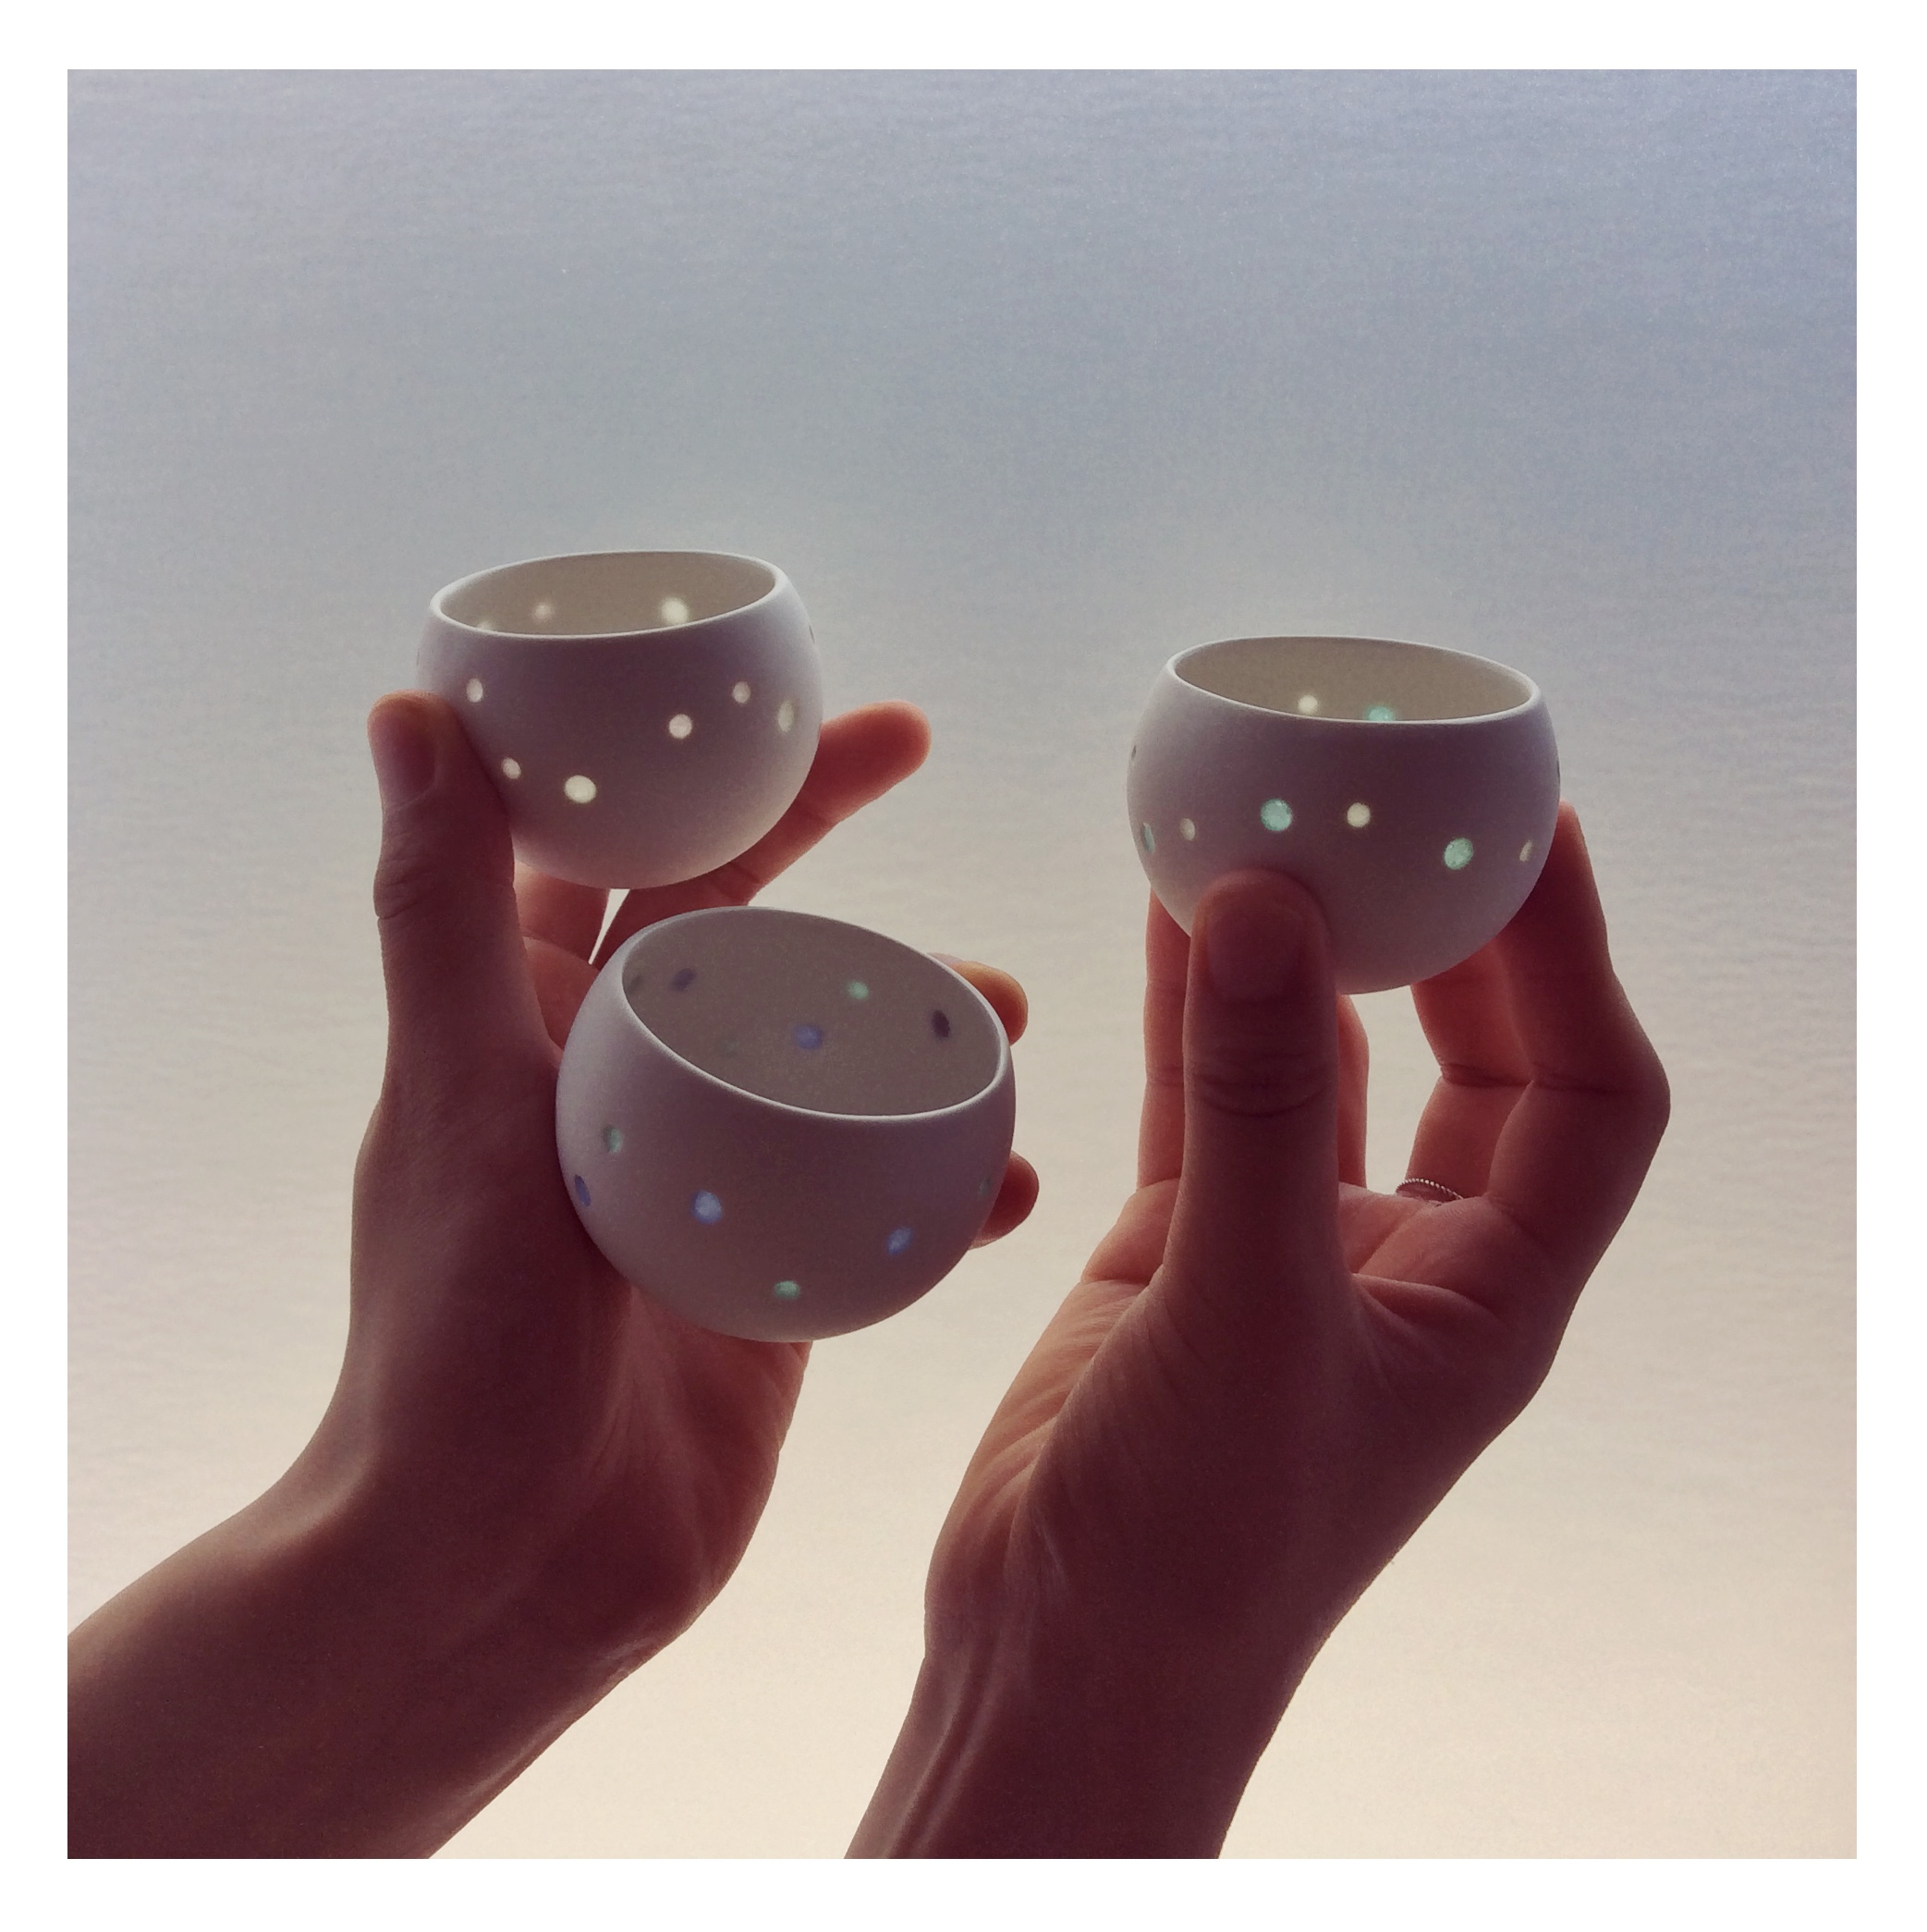 Hotaru (3 color variations) - Wind Bell also Candle Holder